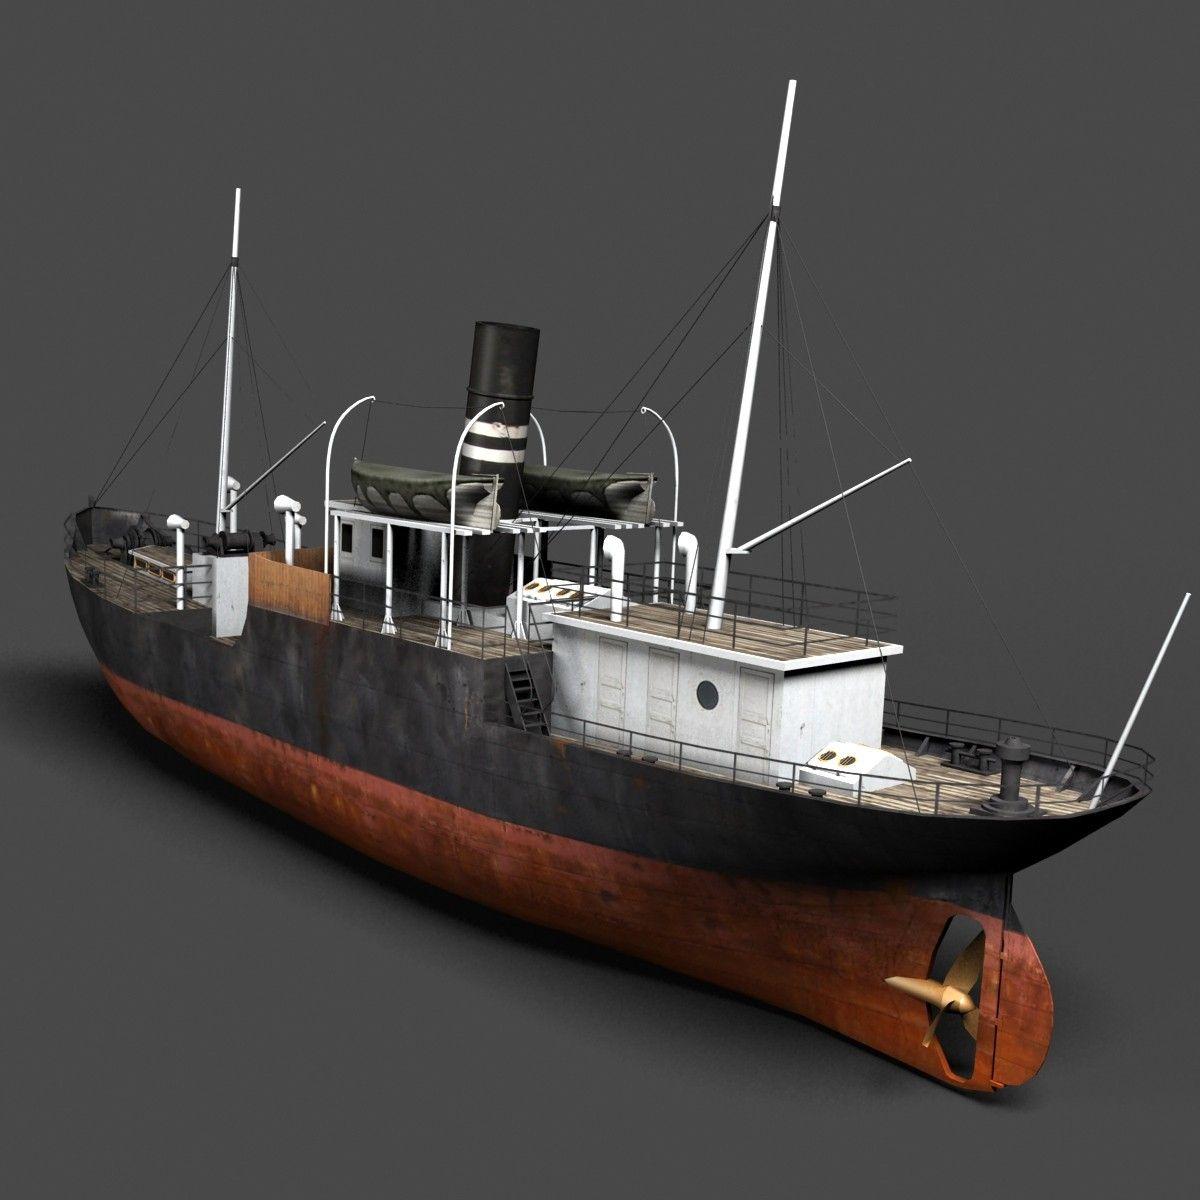 old steam ship 3d model | adventure | Scale model ships, Model ships, Flying ship